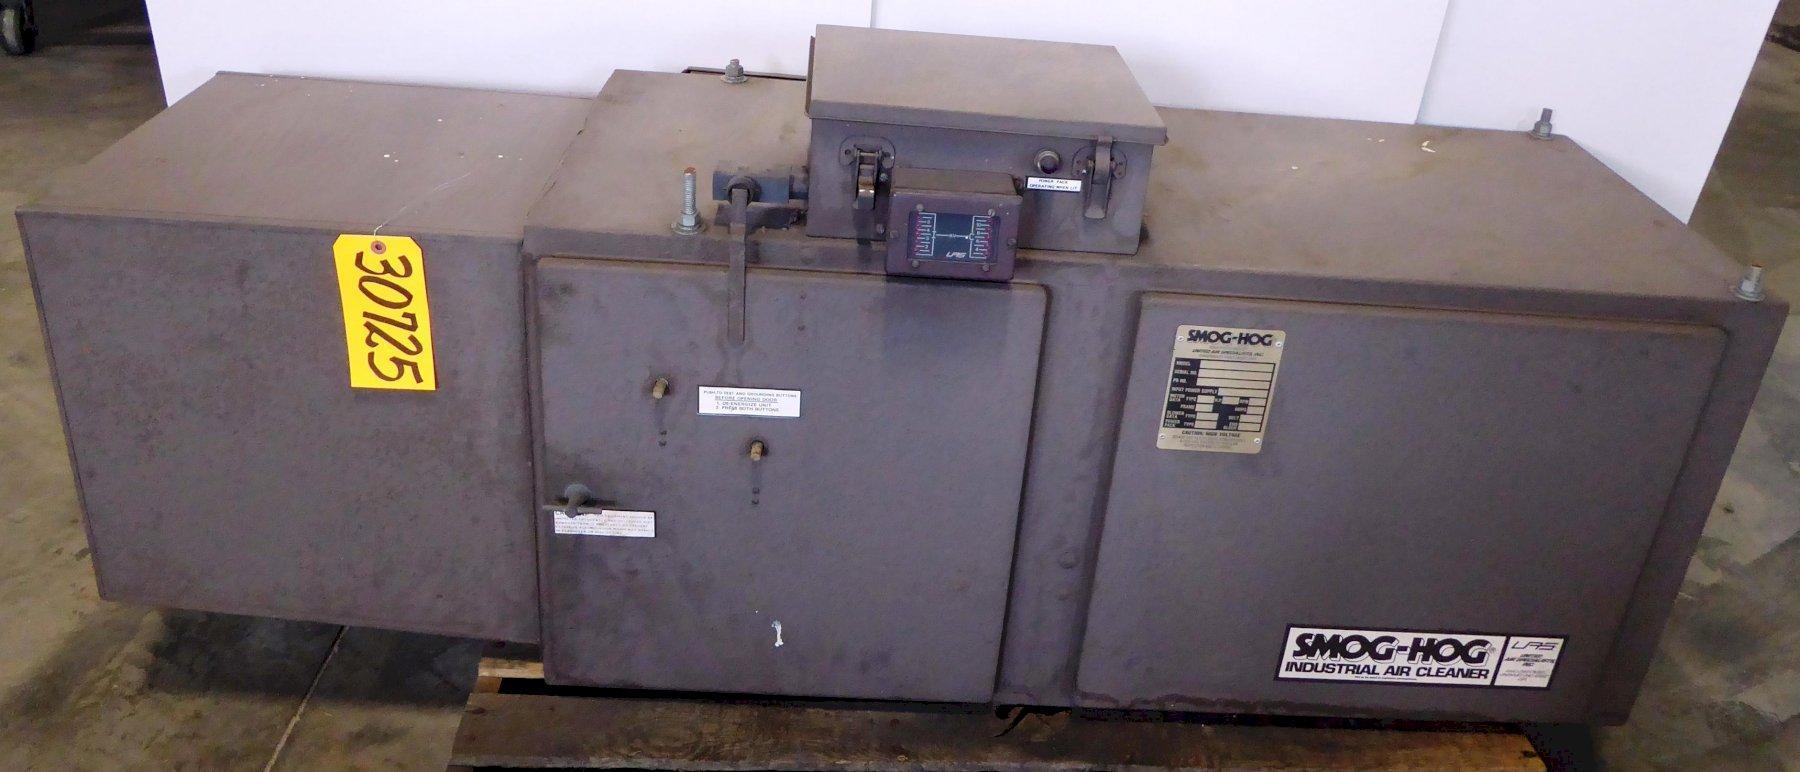 SMOG-HOG Model SH-10-PE-H Smoke, Mist & Dust Collector, 625-1350 CFM, 1 HP, Nice